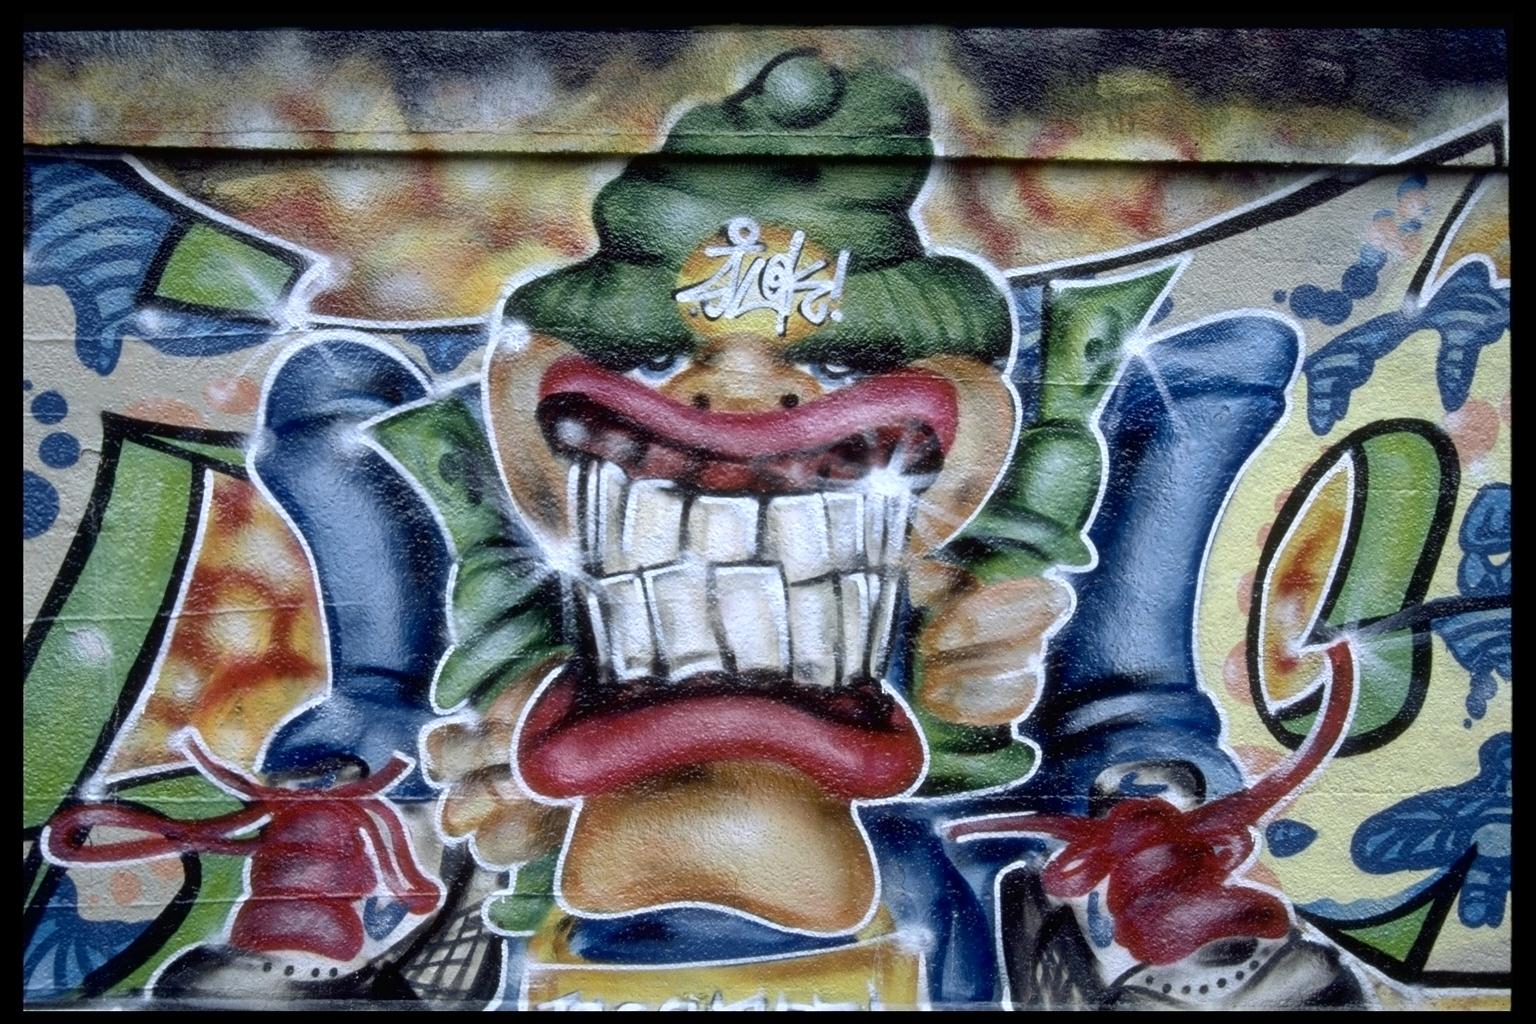 Самые пиздатые граффити vkontakte допускаете